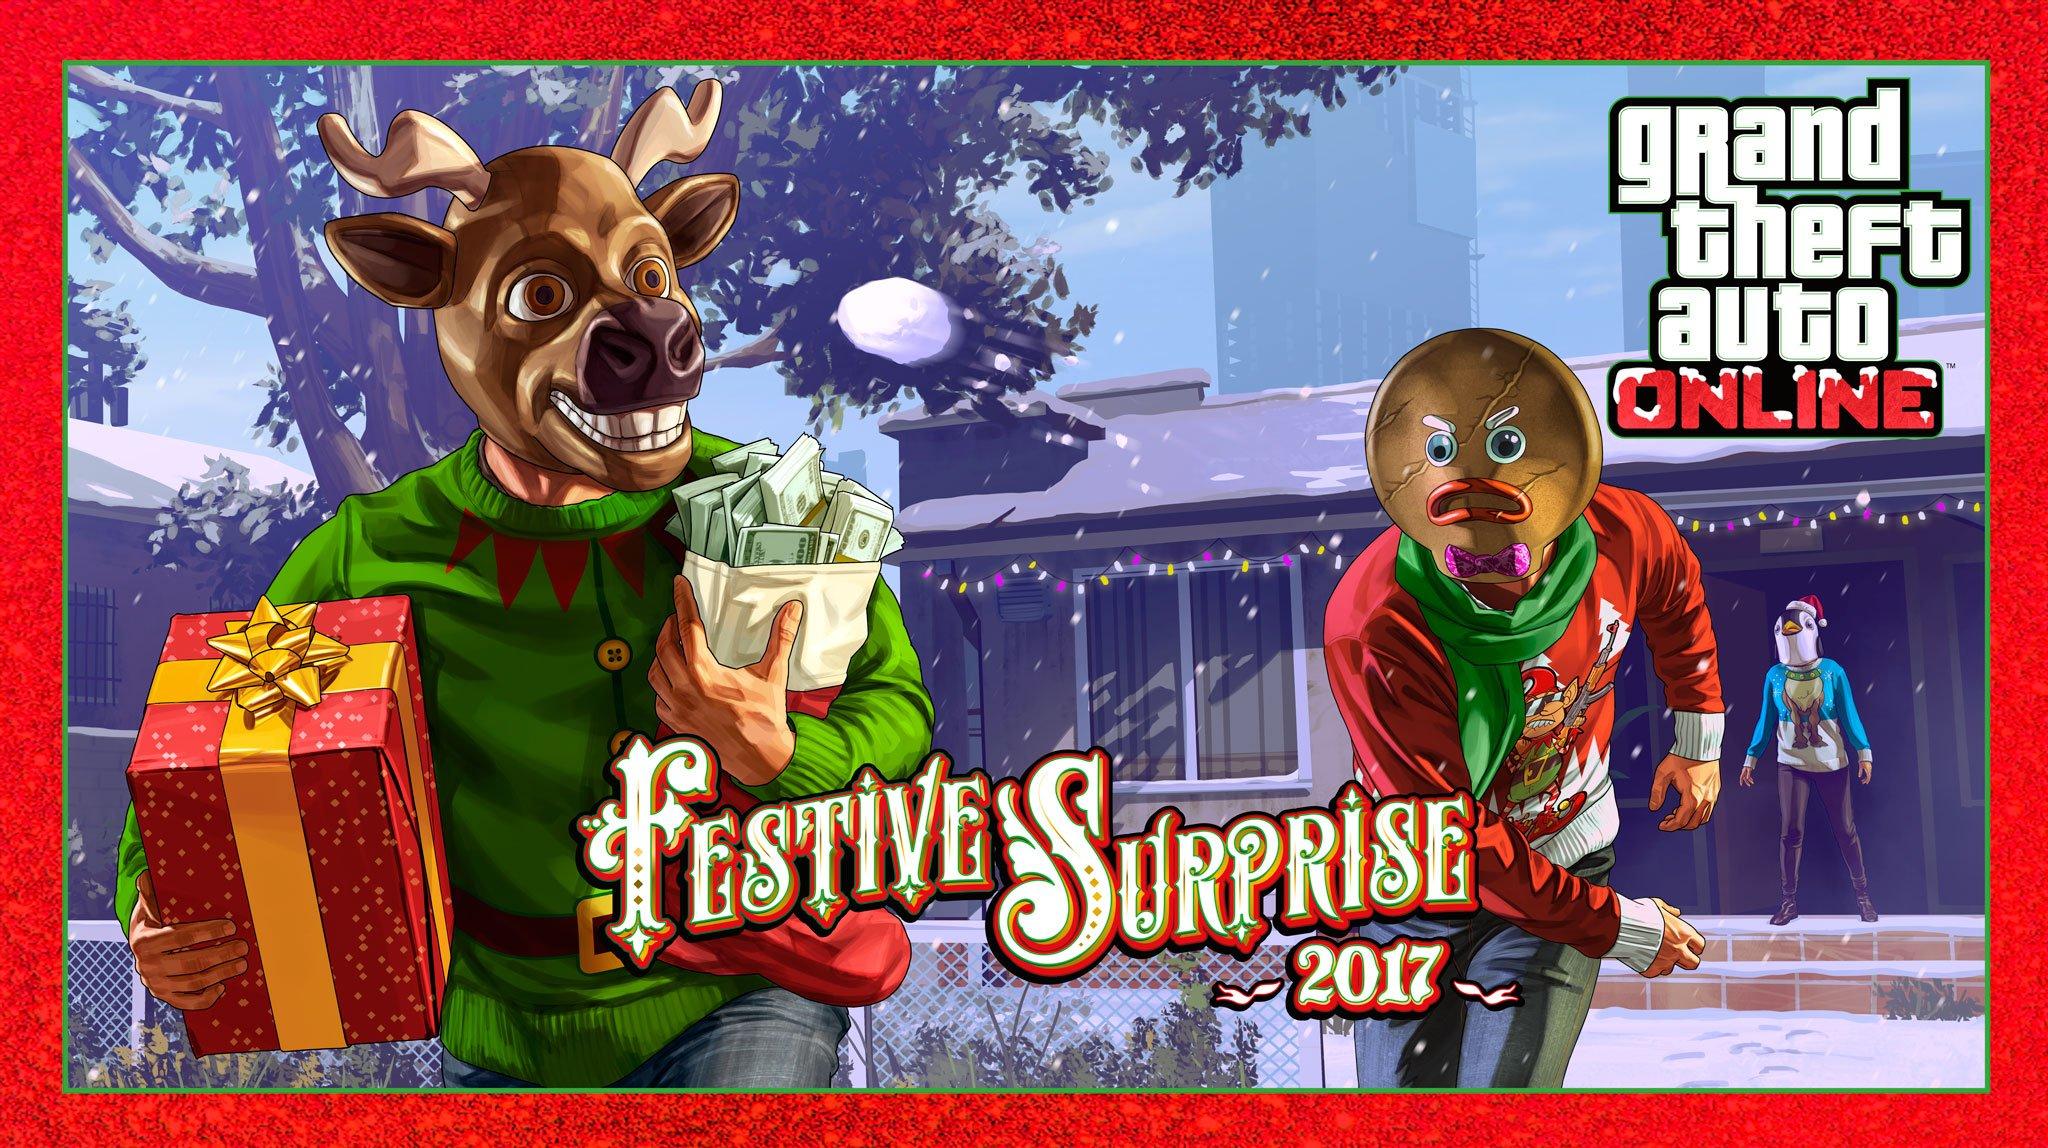 Photo of Grand Theft Auto Online's Festive Surprise 2017 Brings Snow & Discounts